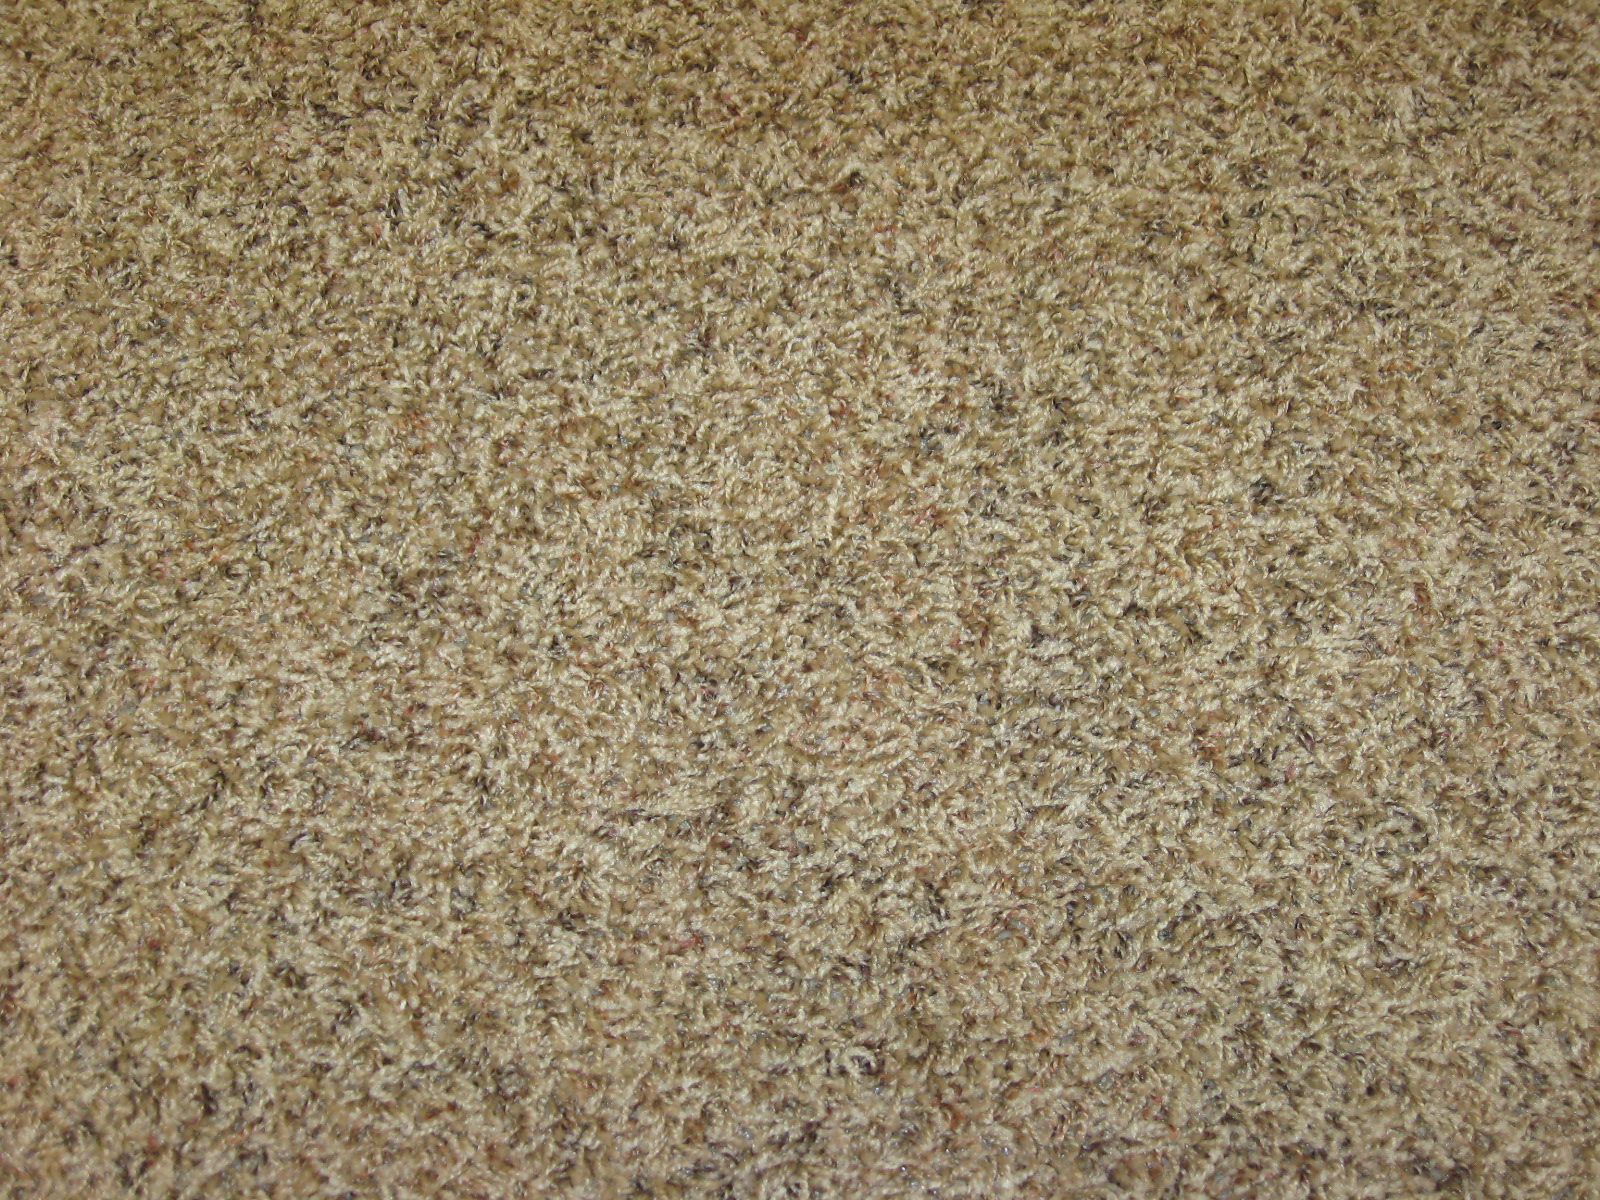 California Berber Carpet S Carpet Vidalondon